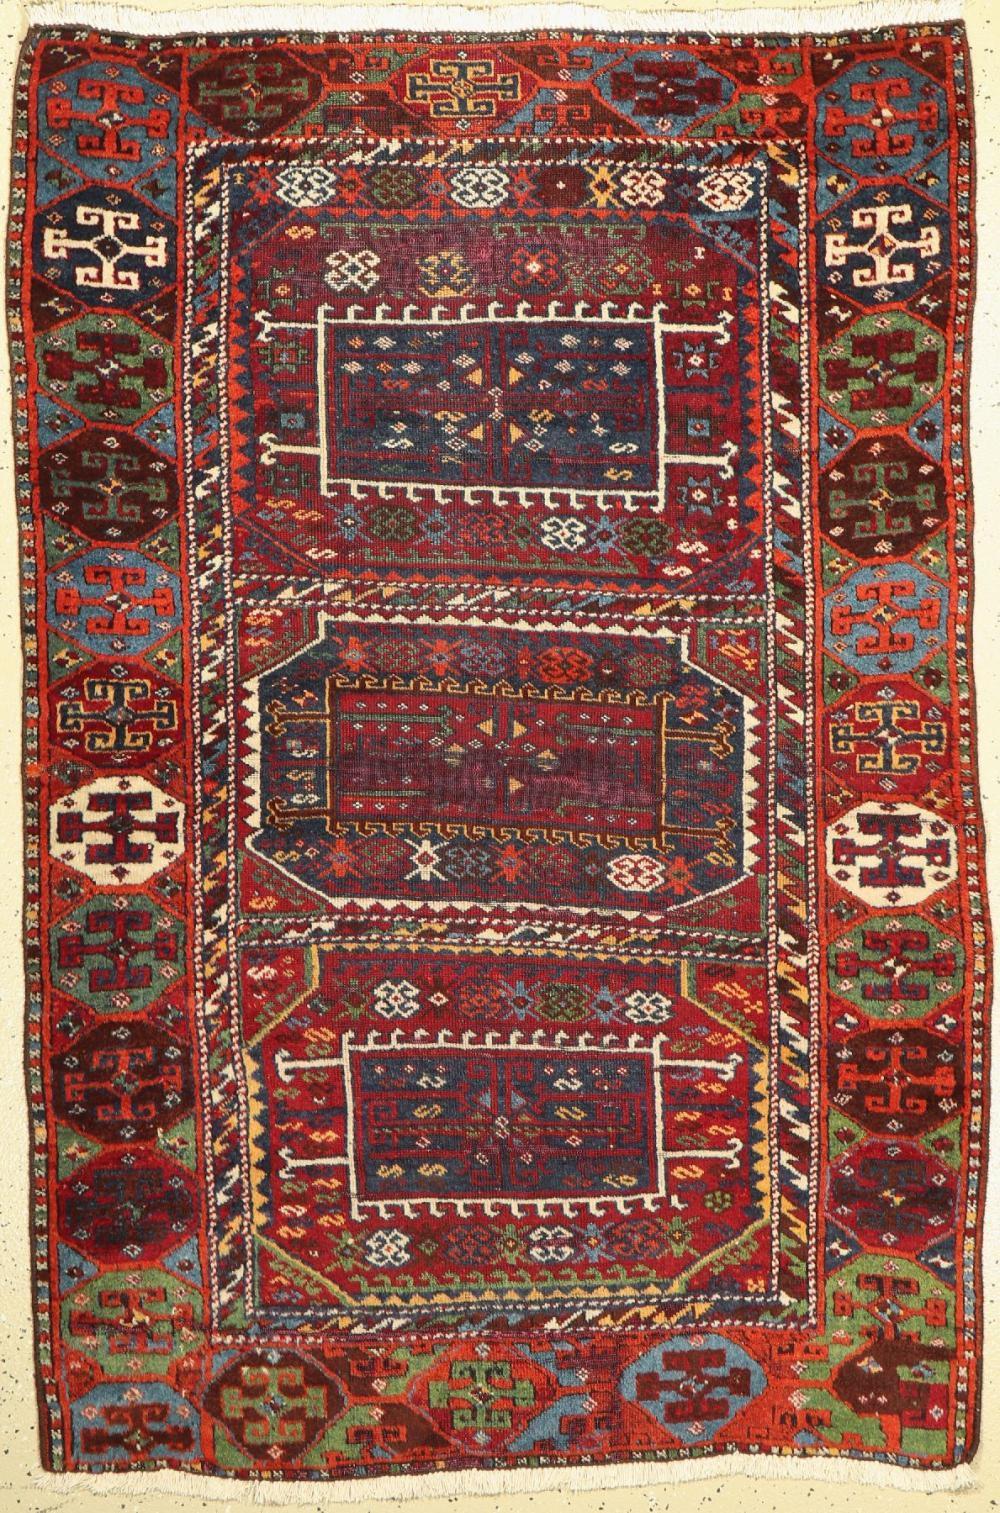 Kurdish village carpet, Turkey, end of the 19th